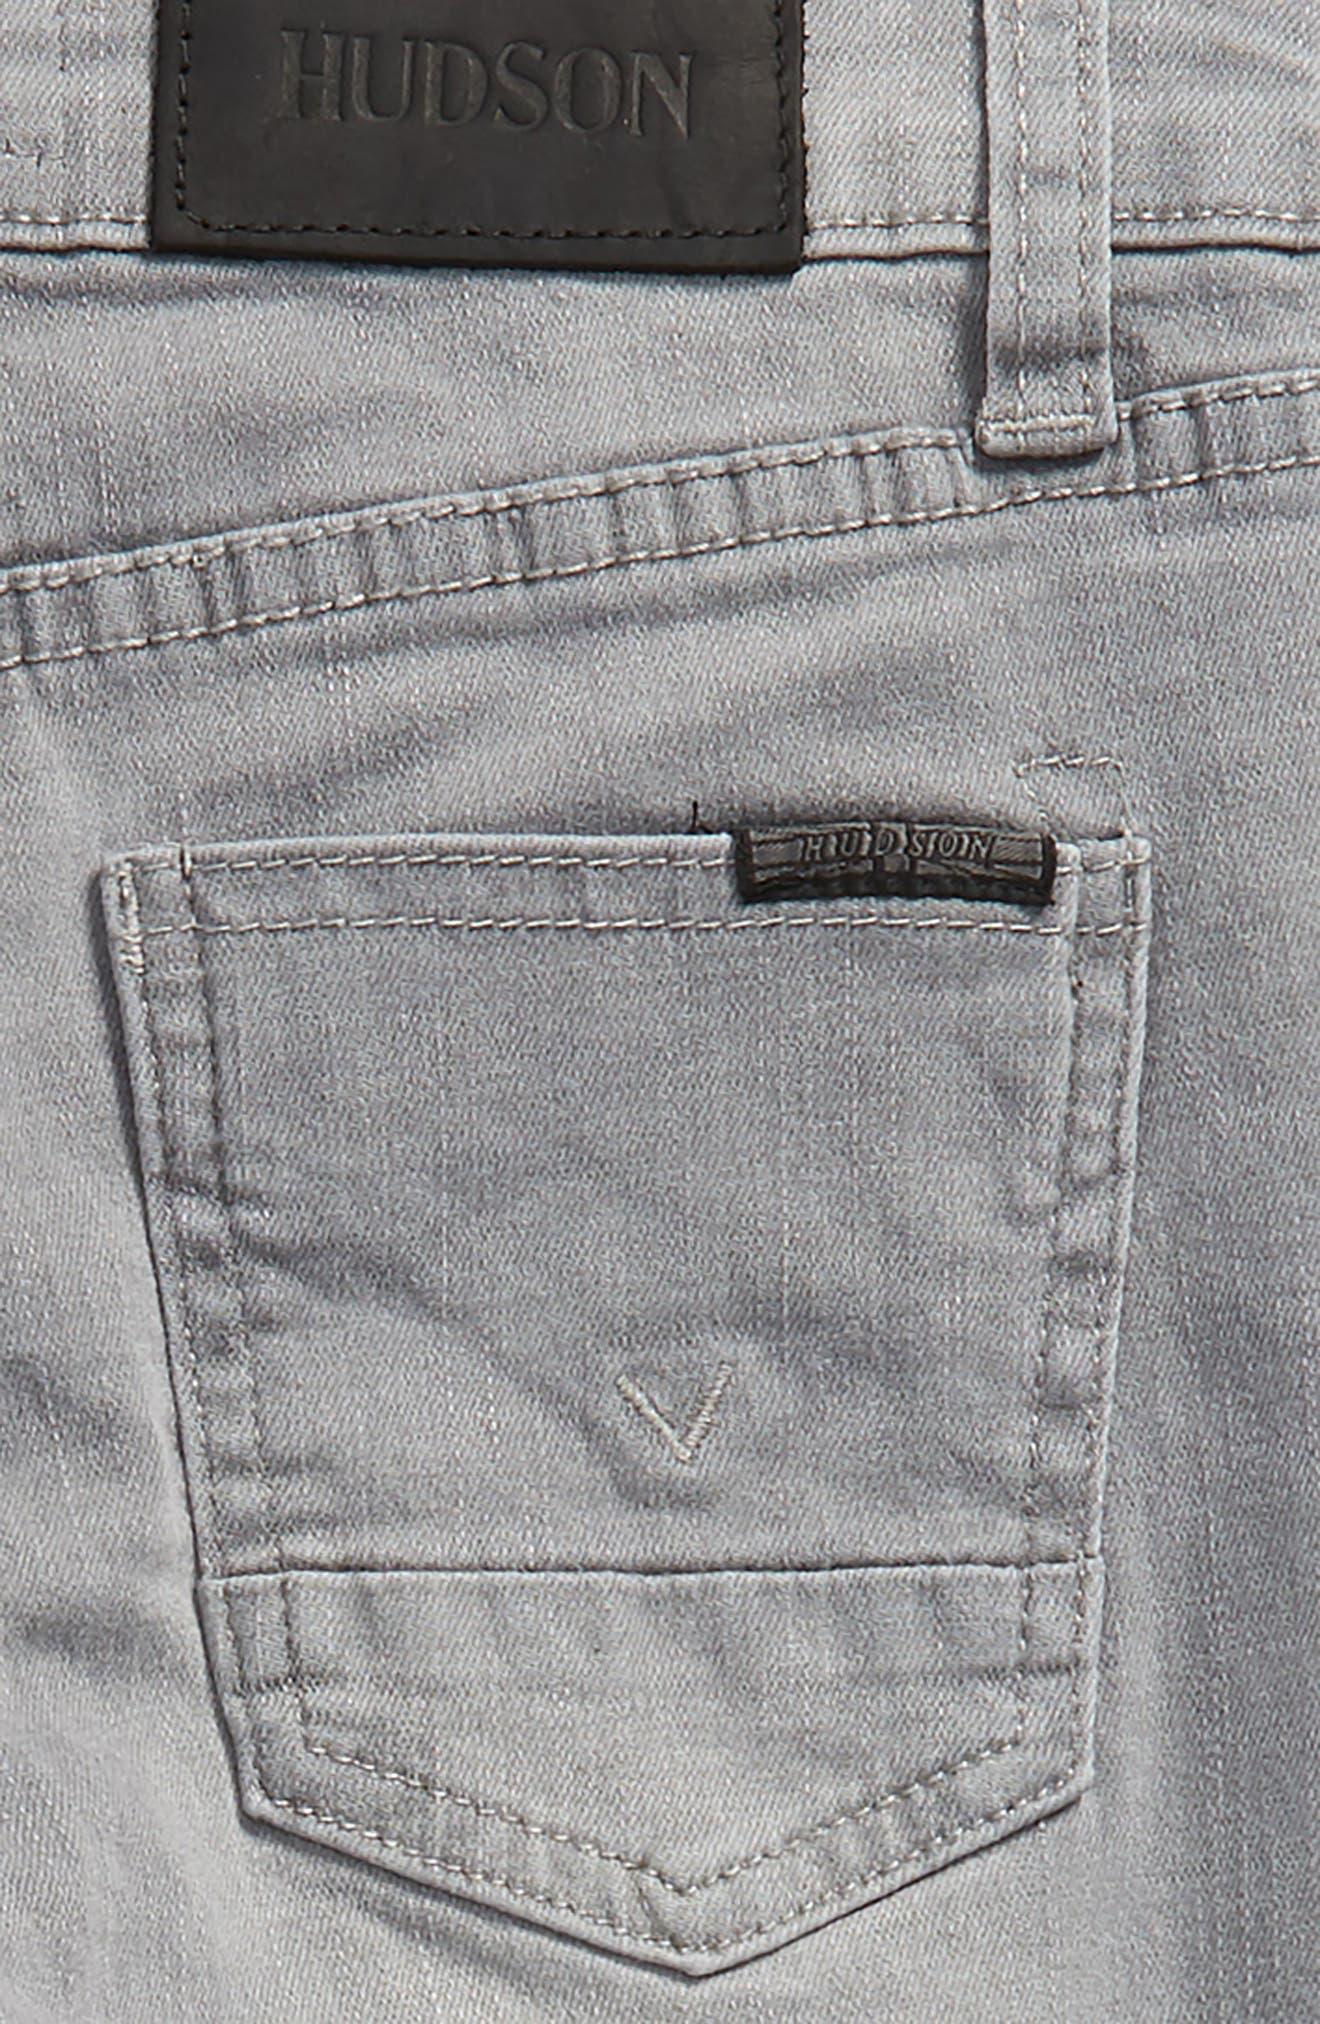 Jude Slim Fit Skinny Jeans,                             Alternate thumbnail 3, color,                             Ice Grey